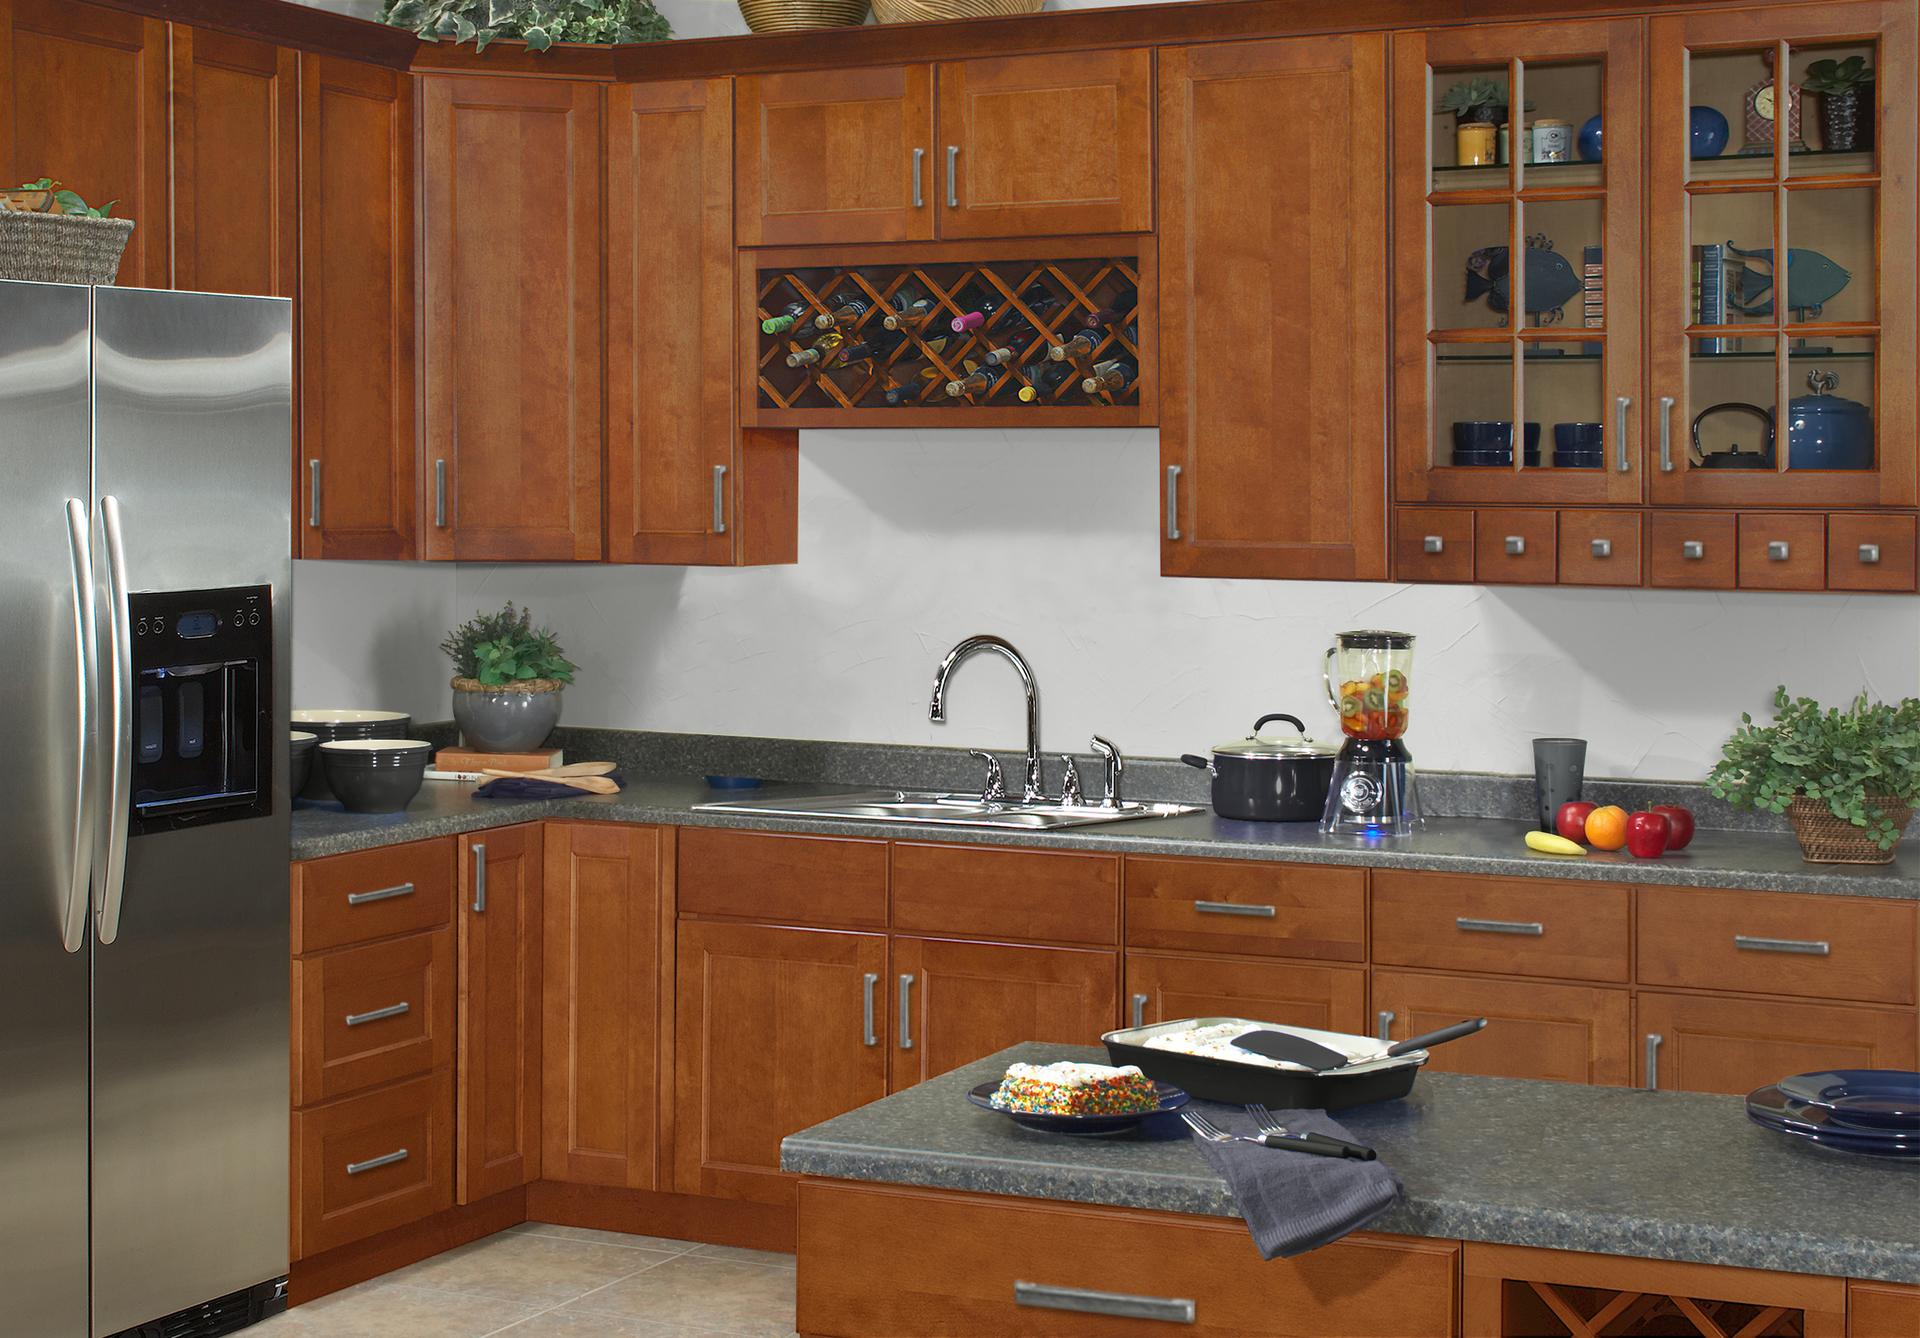 Sunnywood Kitchen Cabinets Ellisen Kitchen Cabinets For Residential Pro